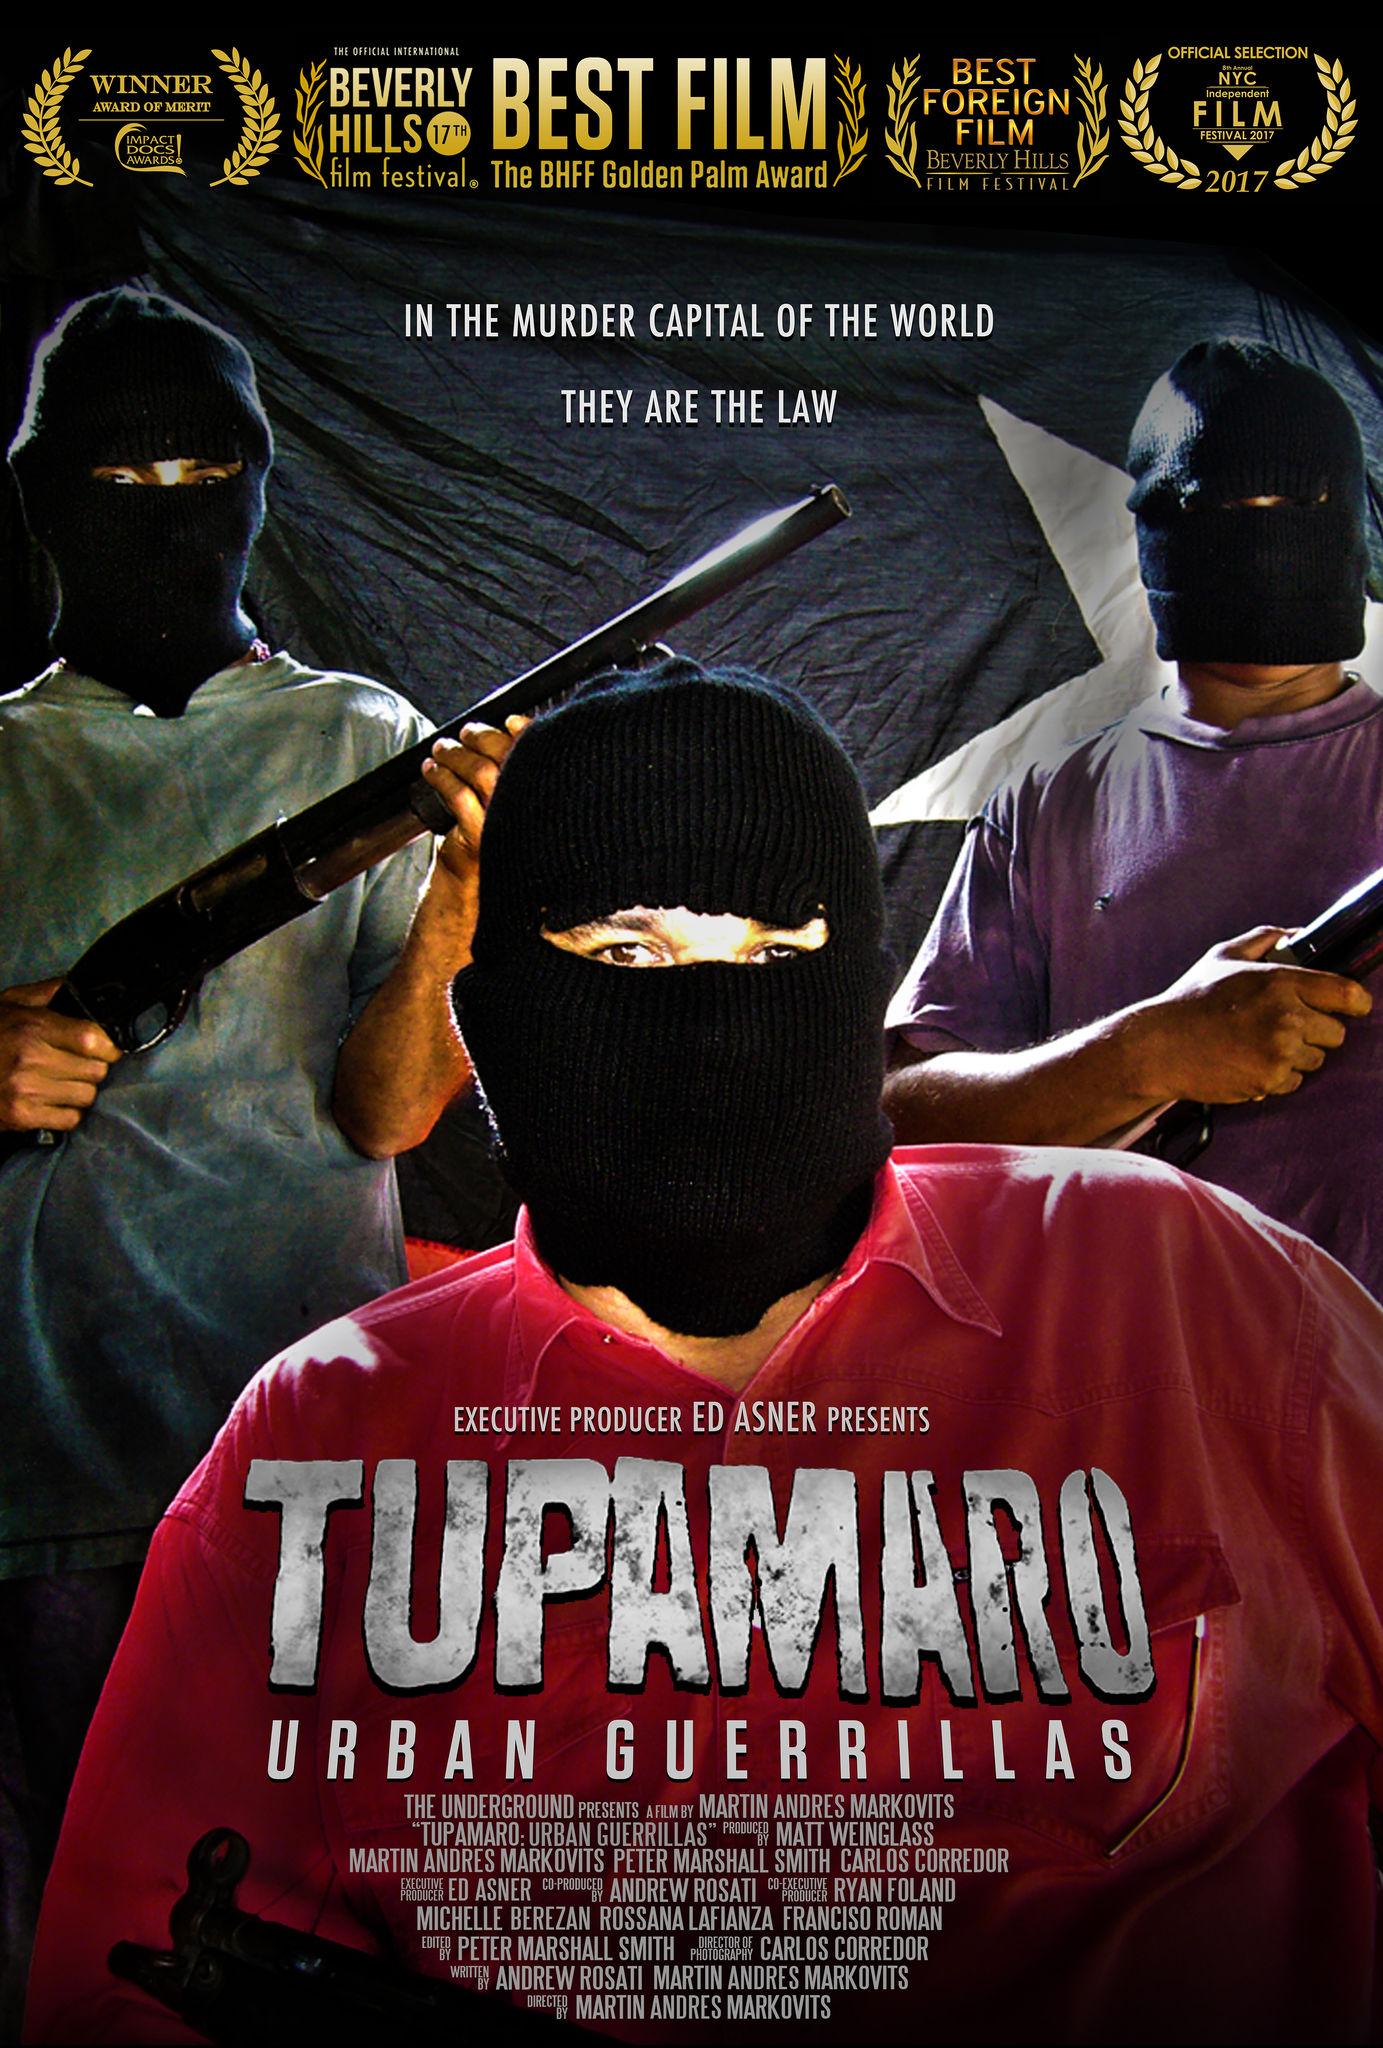 Tupamaro: Urban Guerrillas